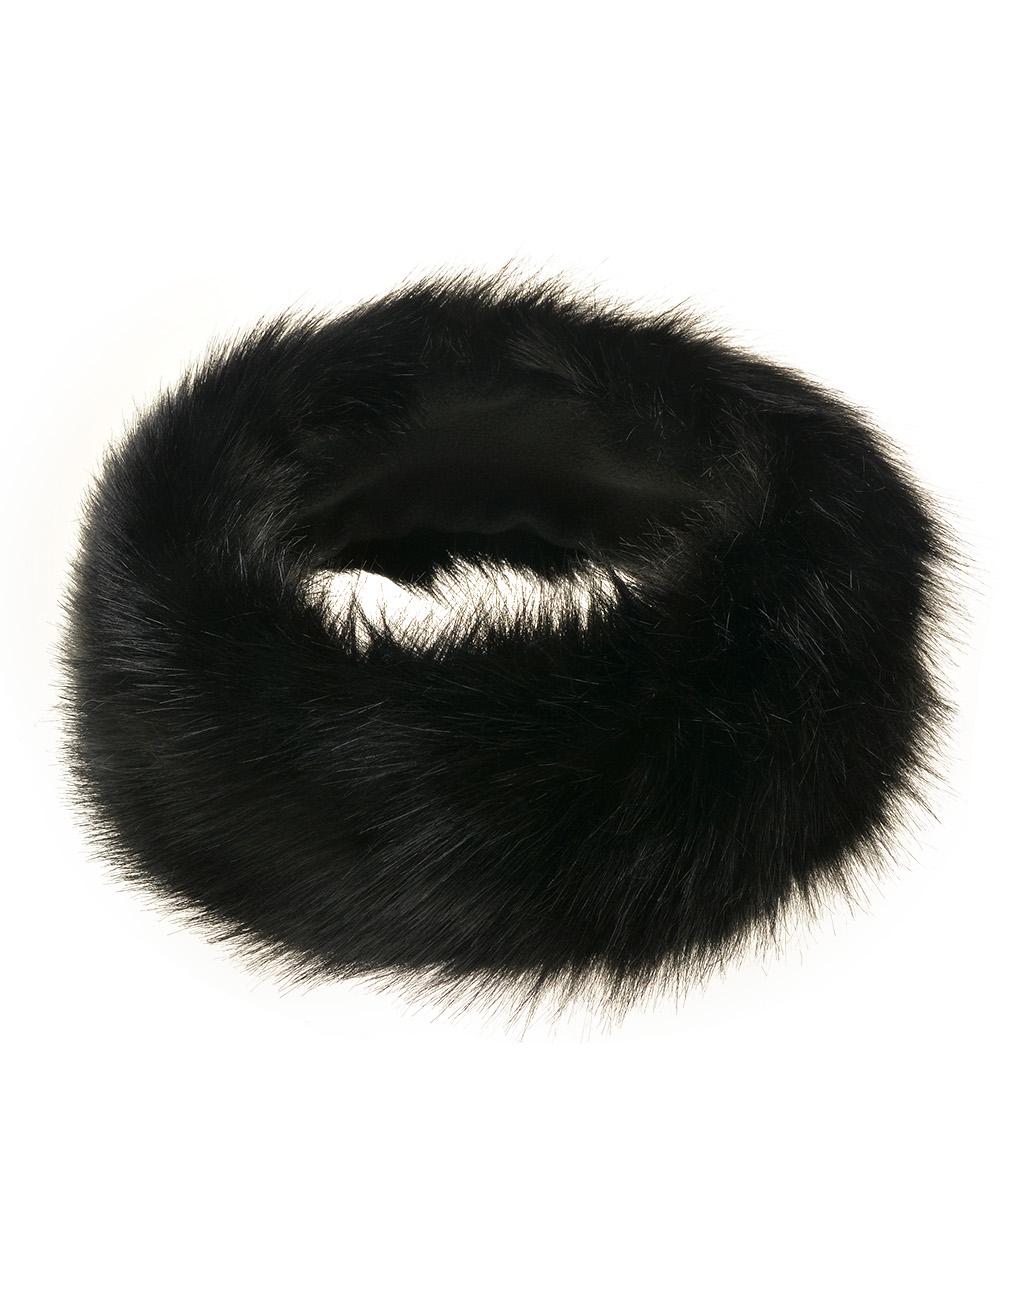 Faux Fur Headband Wholesale Price   Discount eb41c056062